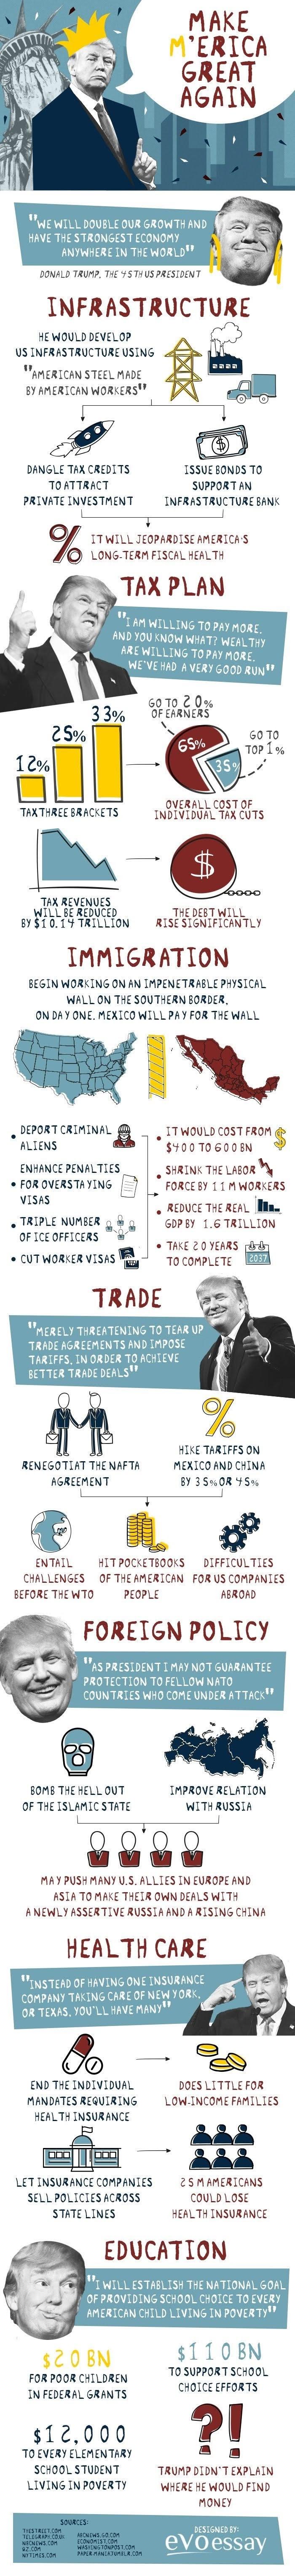 Make America amazing again? #infographic